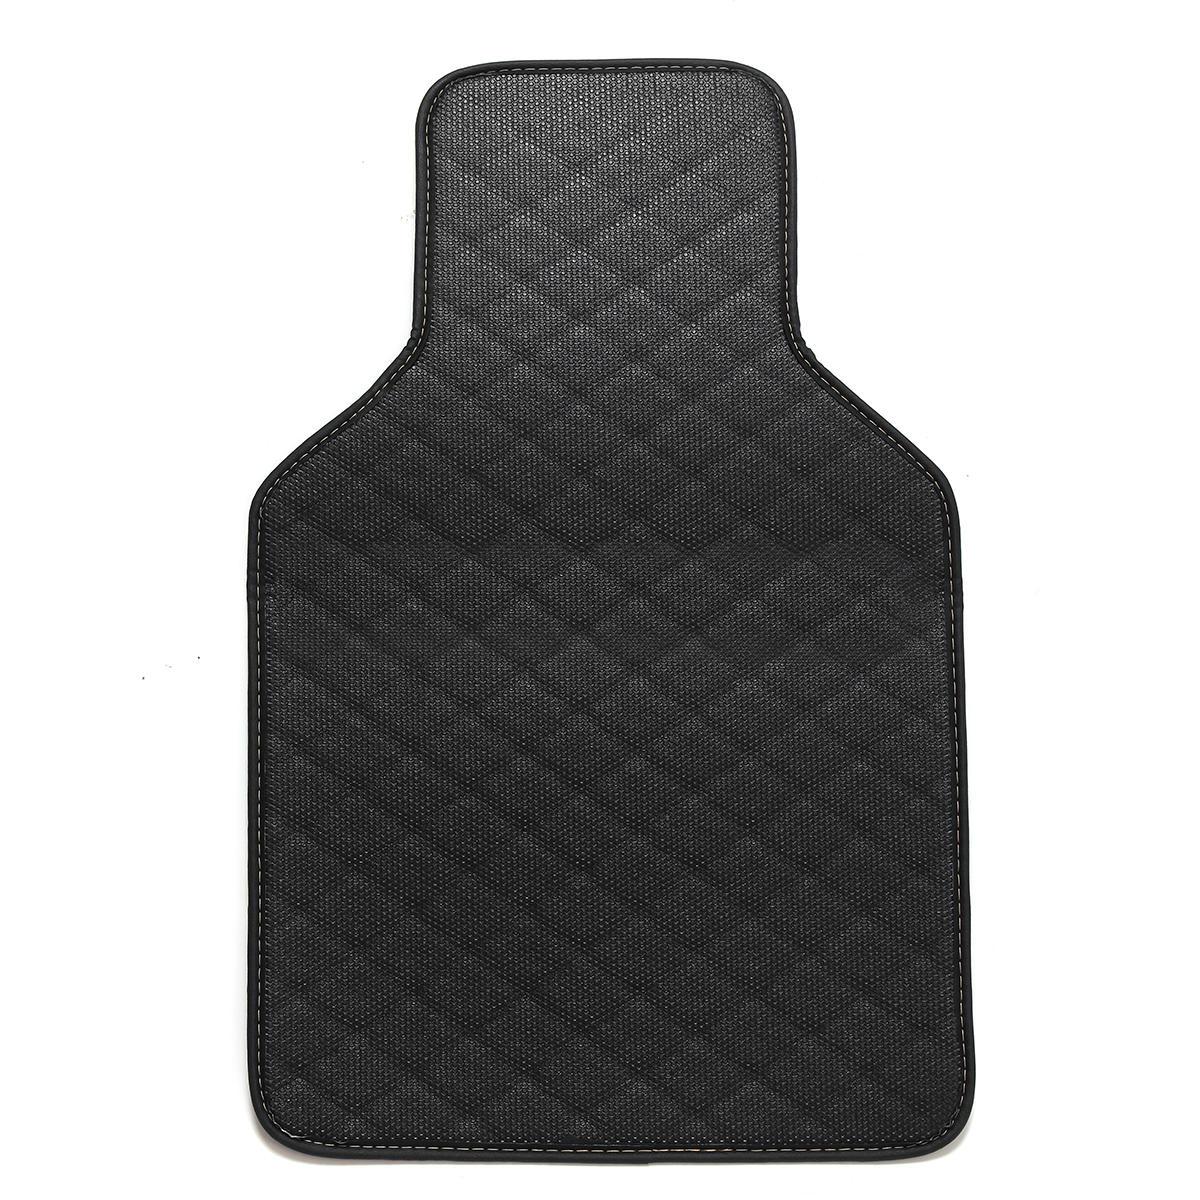 4 PCS Car Floor Mats Front & Rear Carpet Mat Waterproof For Volvo v40 v60 xc70 v90 xc90 c30 xc60